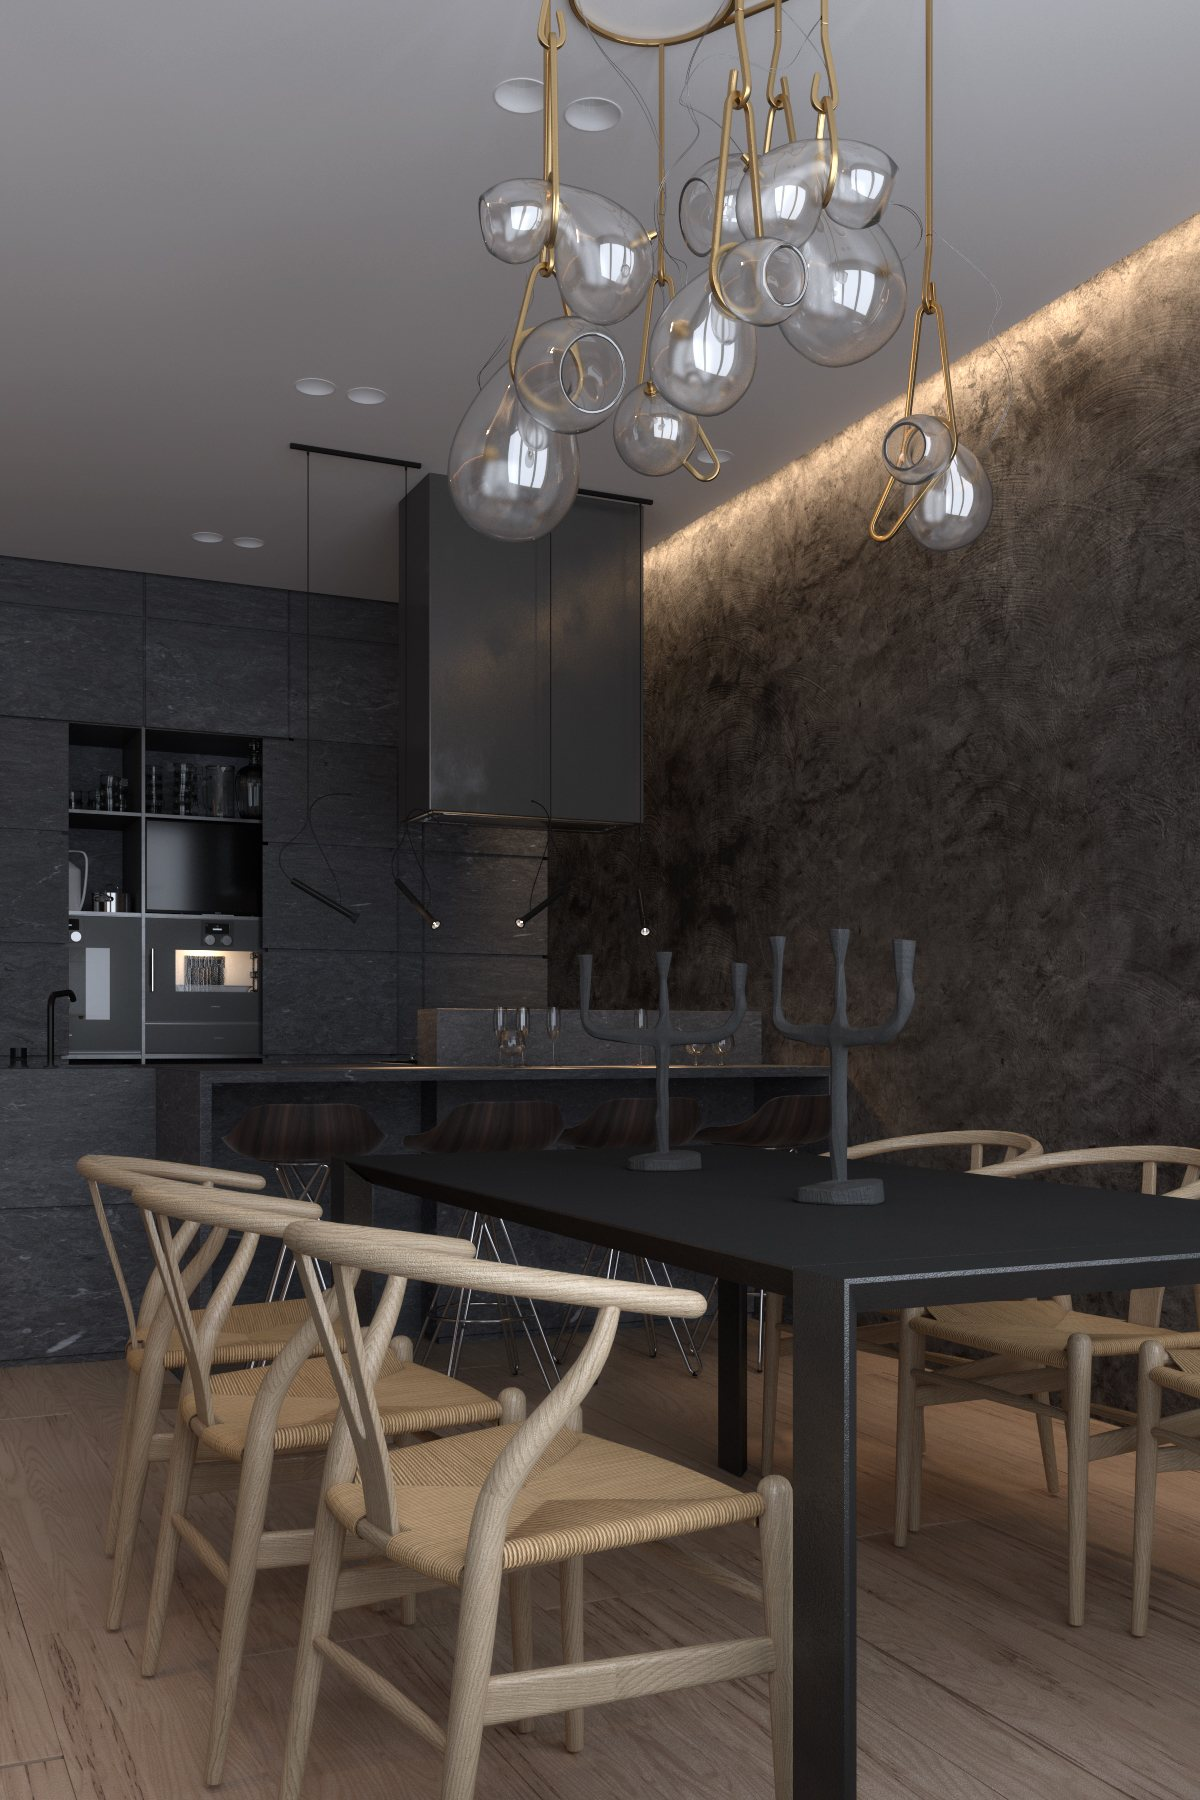 Luxury apartment design with unique chandelier